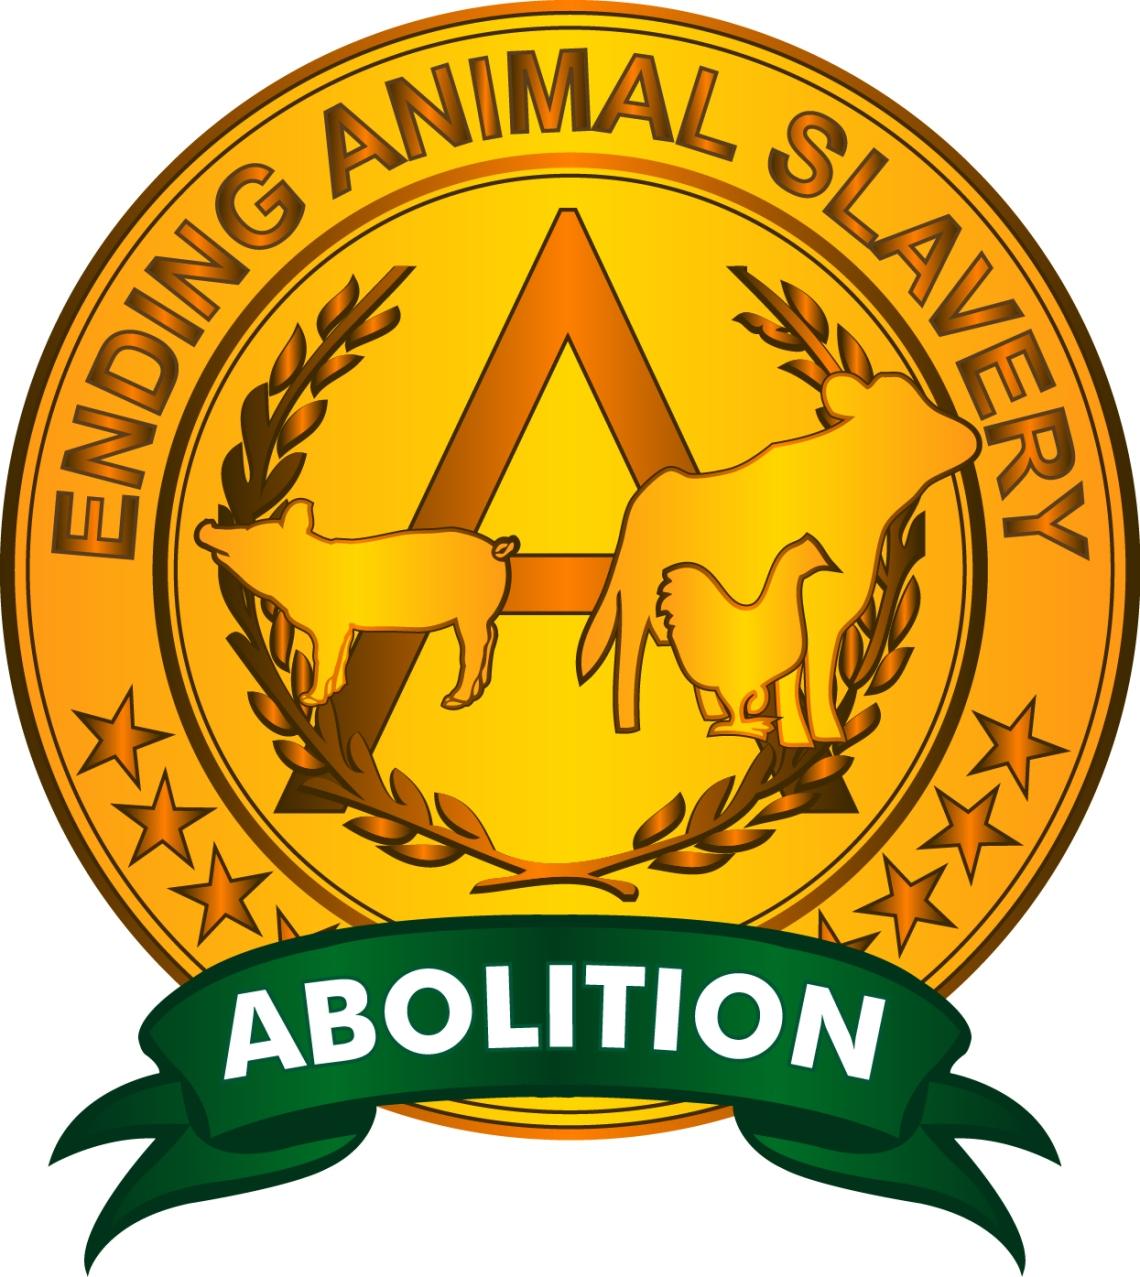 abolition logo